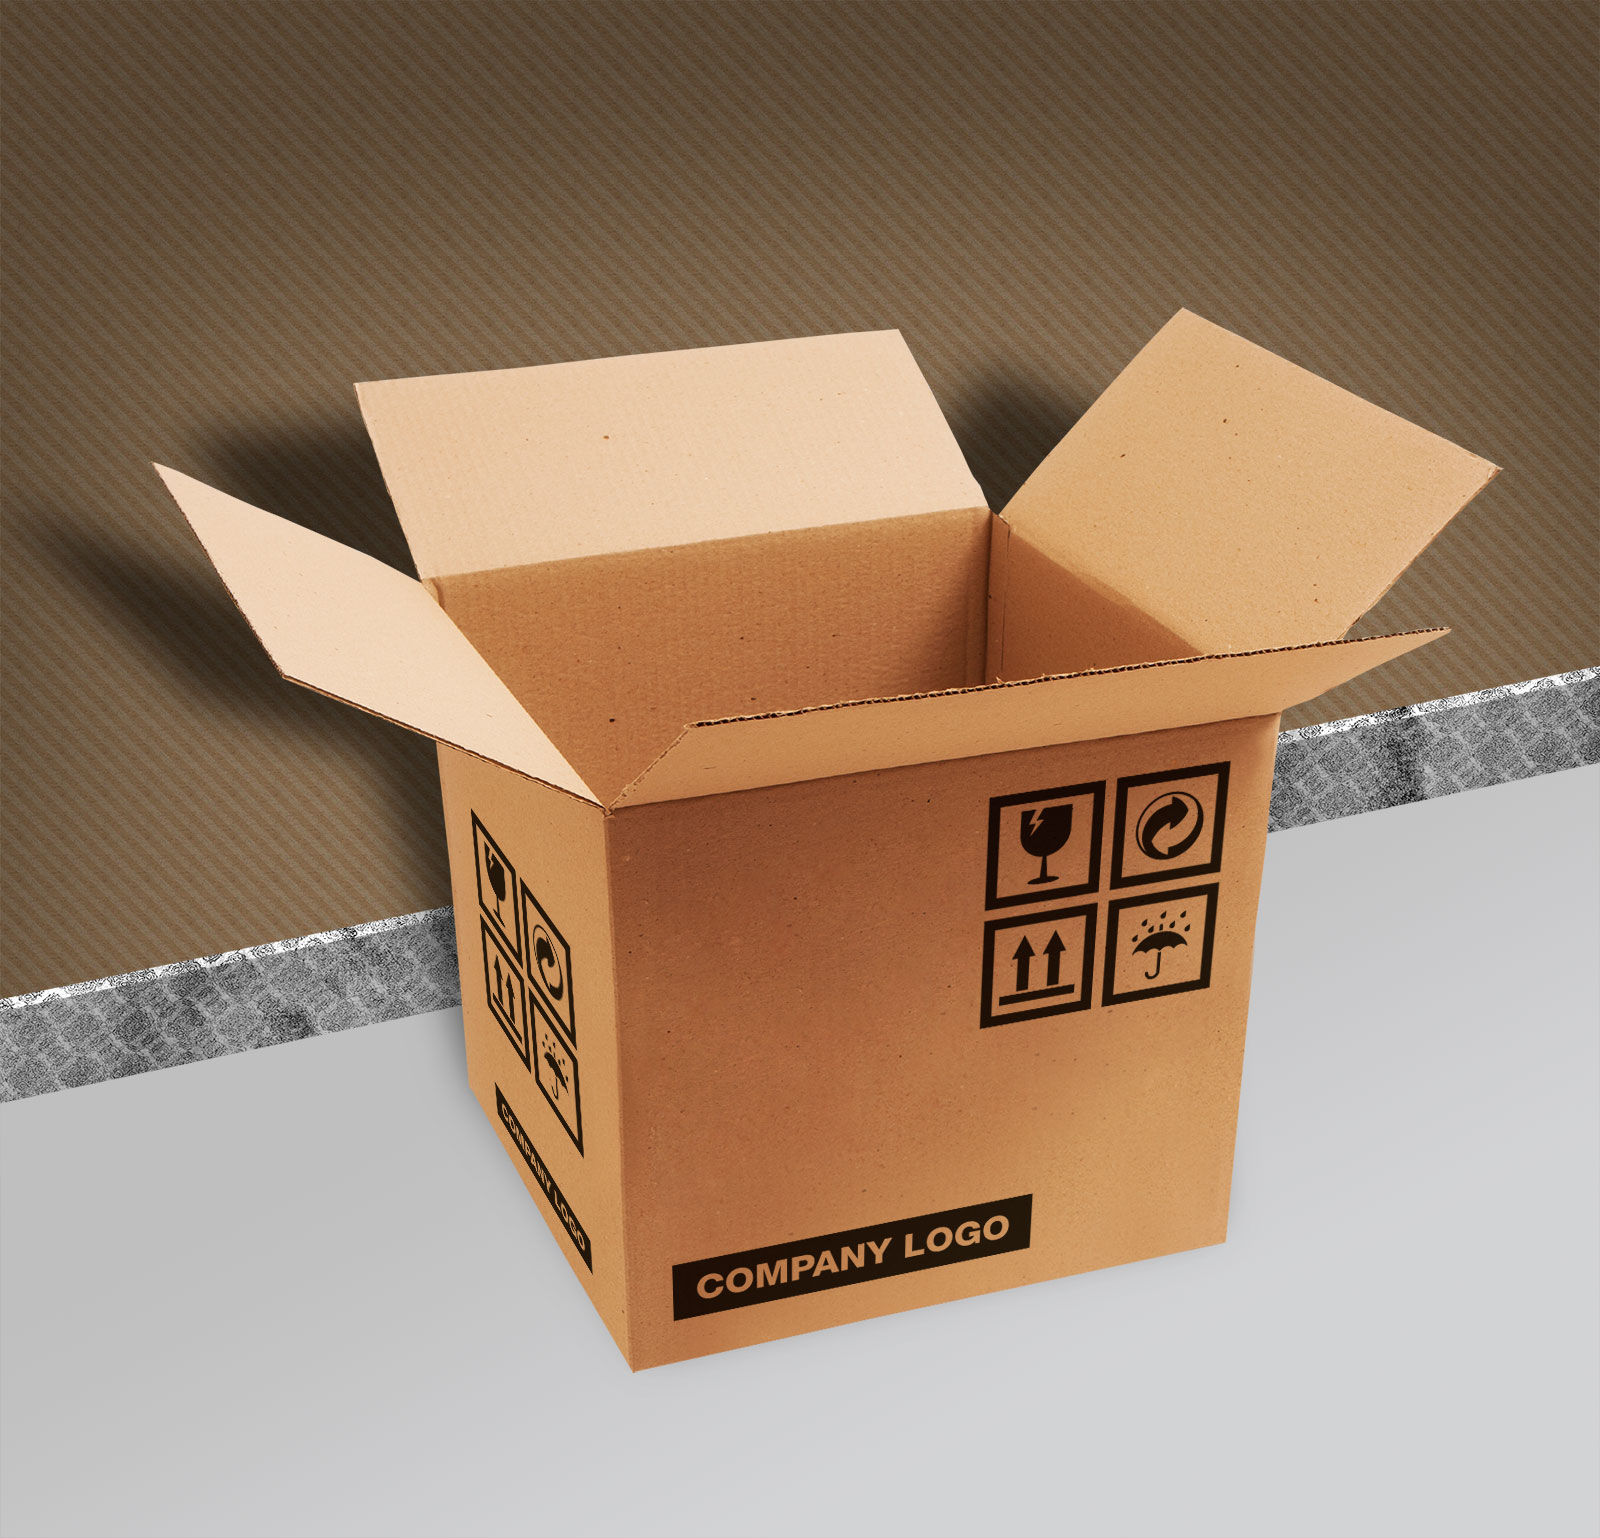 Free-Brown-Corrugated-Carton-Packaging-Box-Mockup-PSD